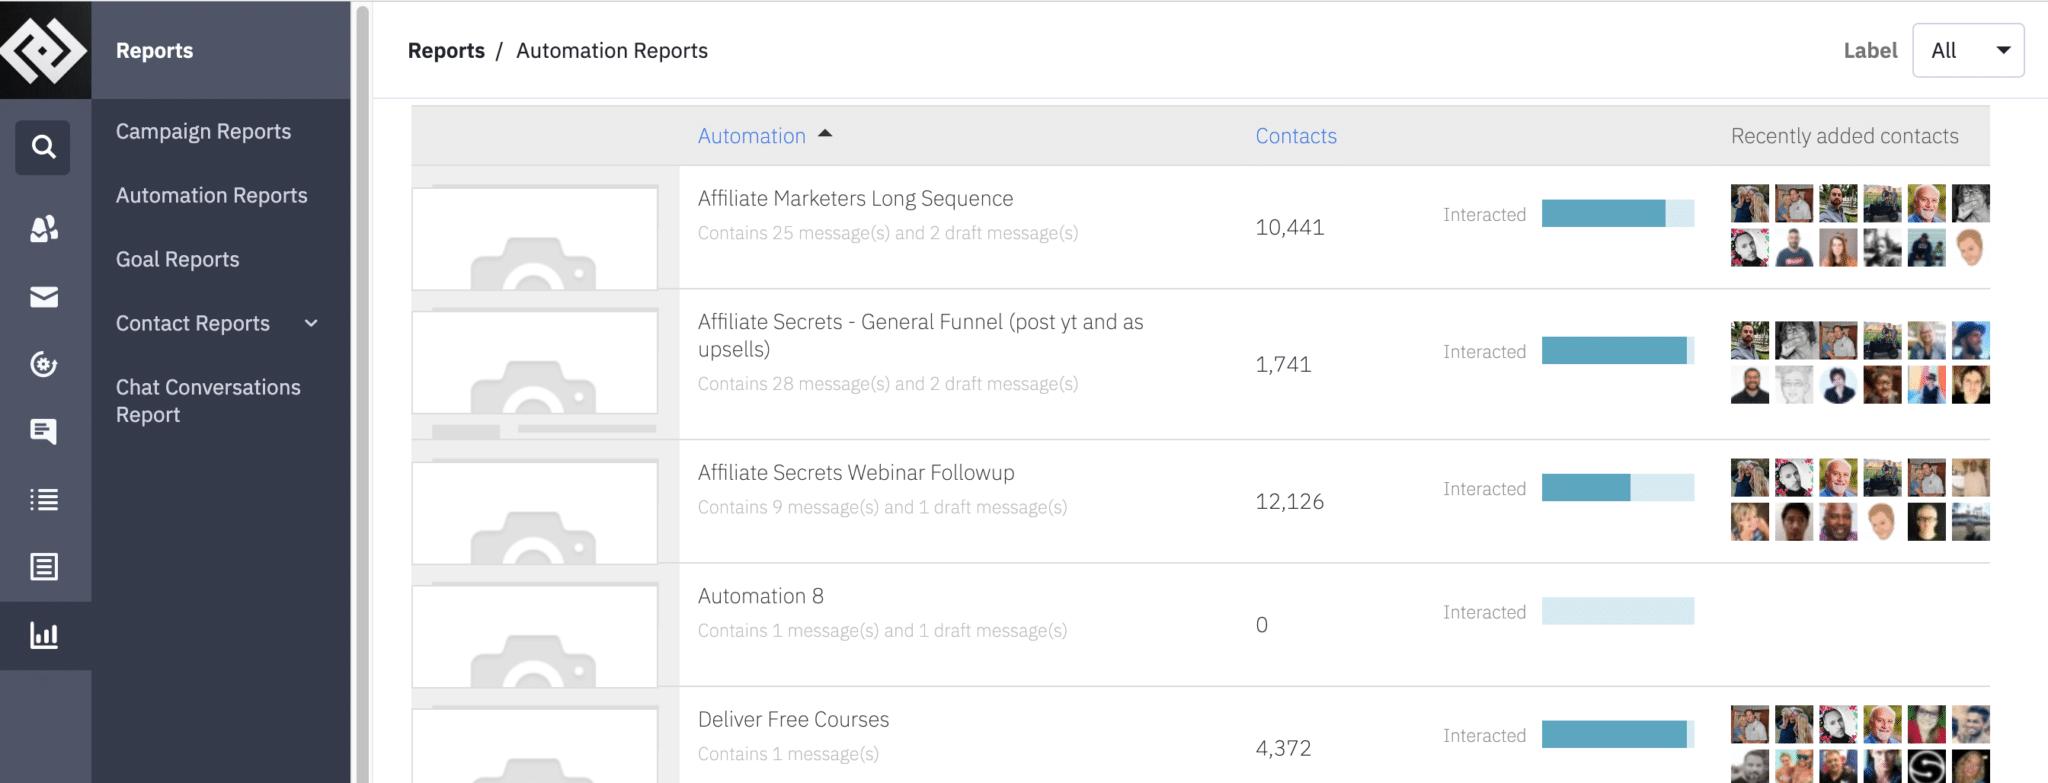 ActiveCampaign Reporting Mailchimp competitors